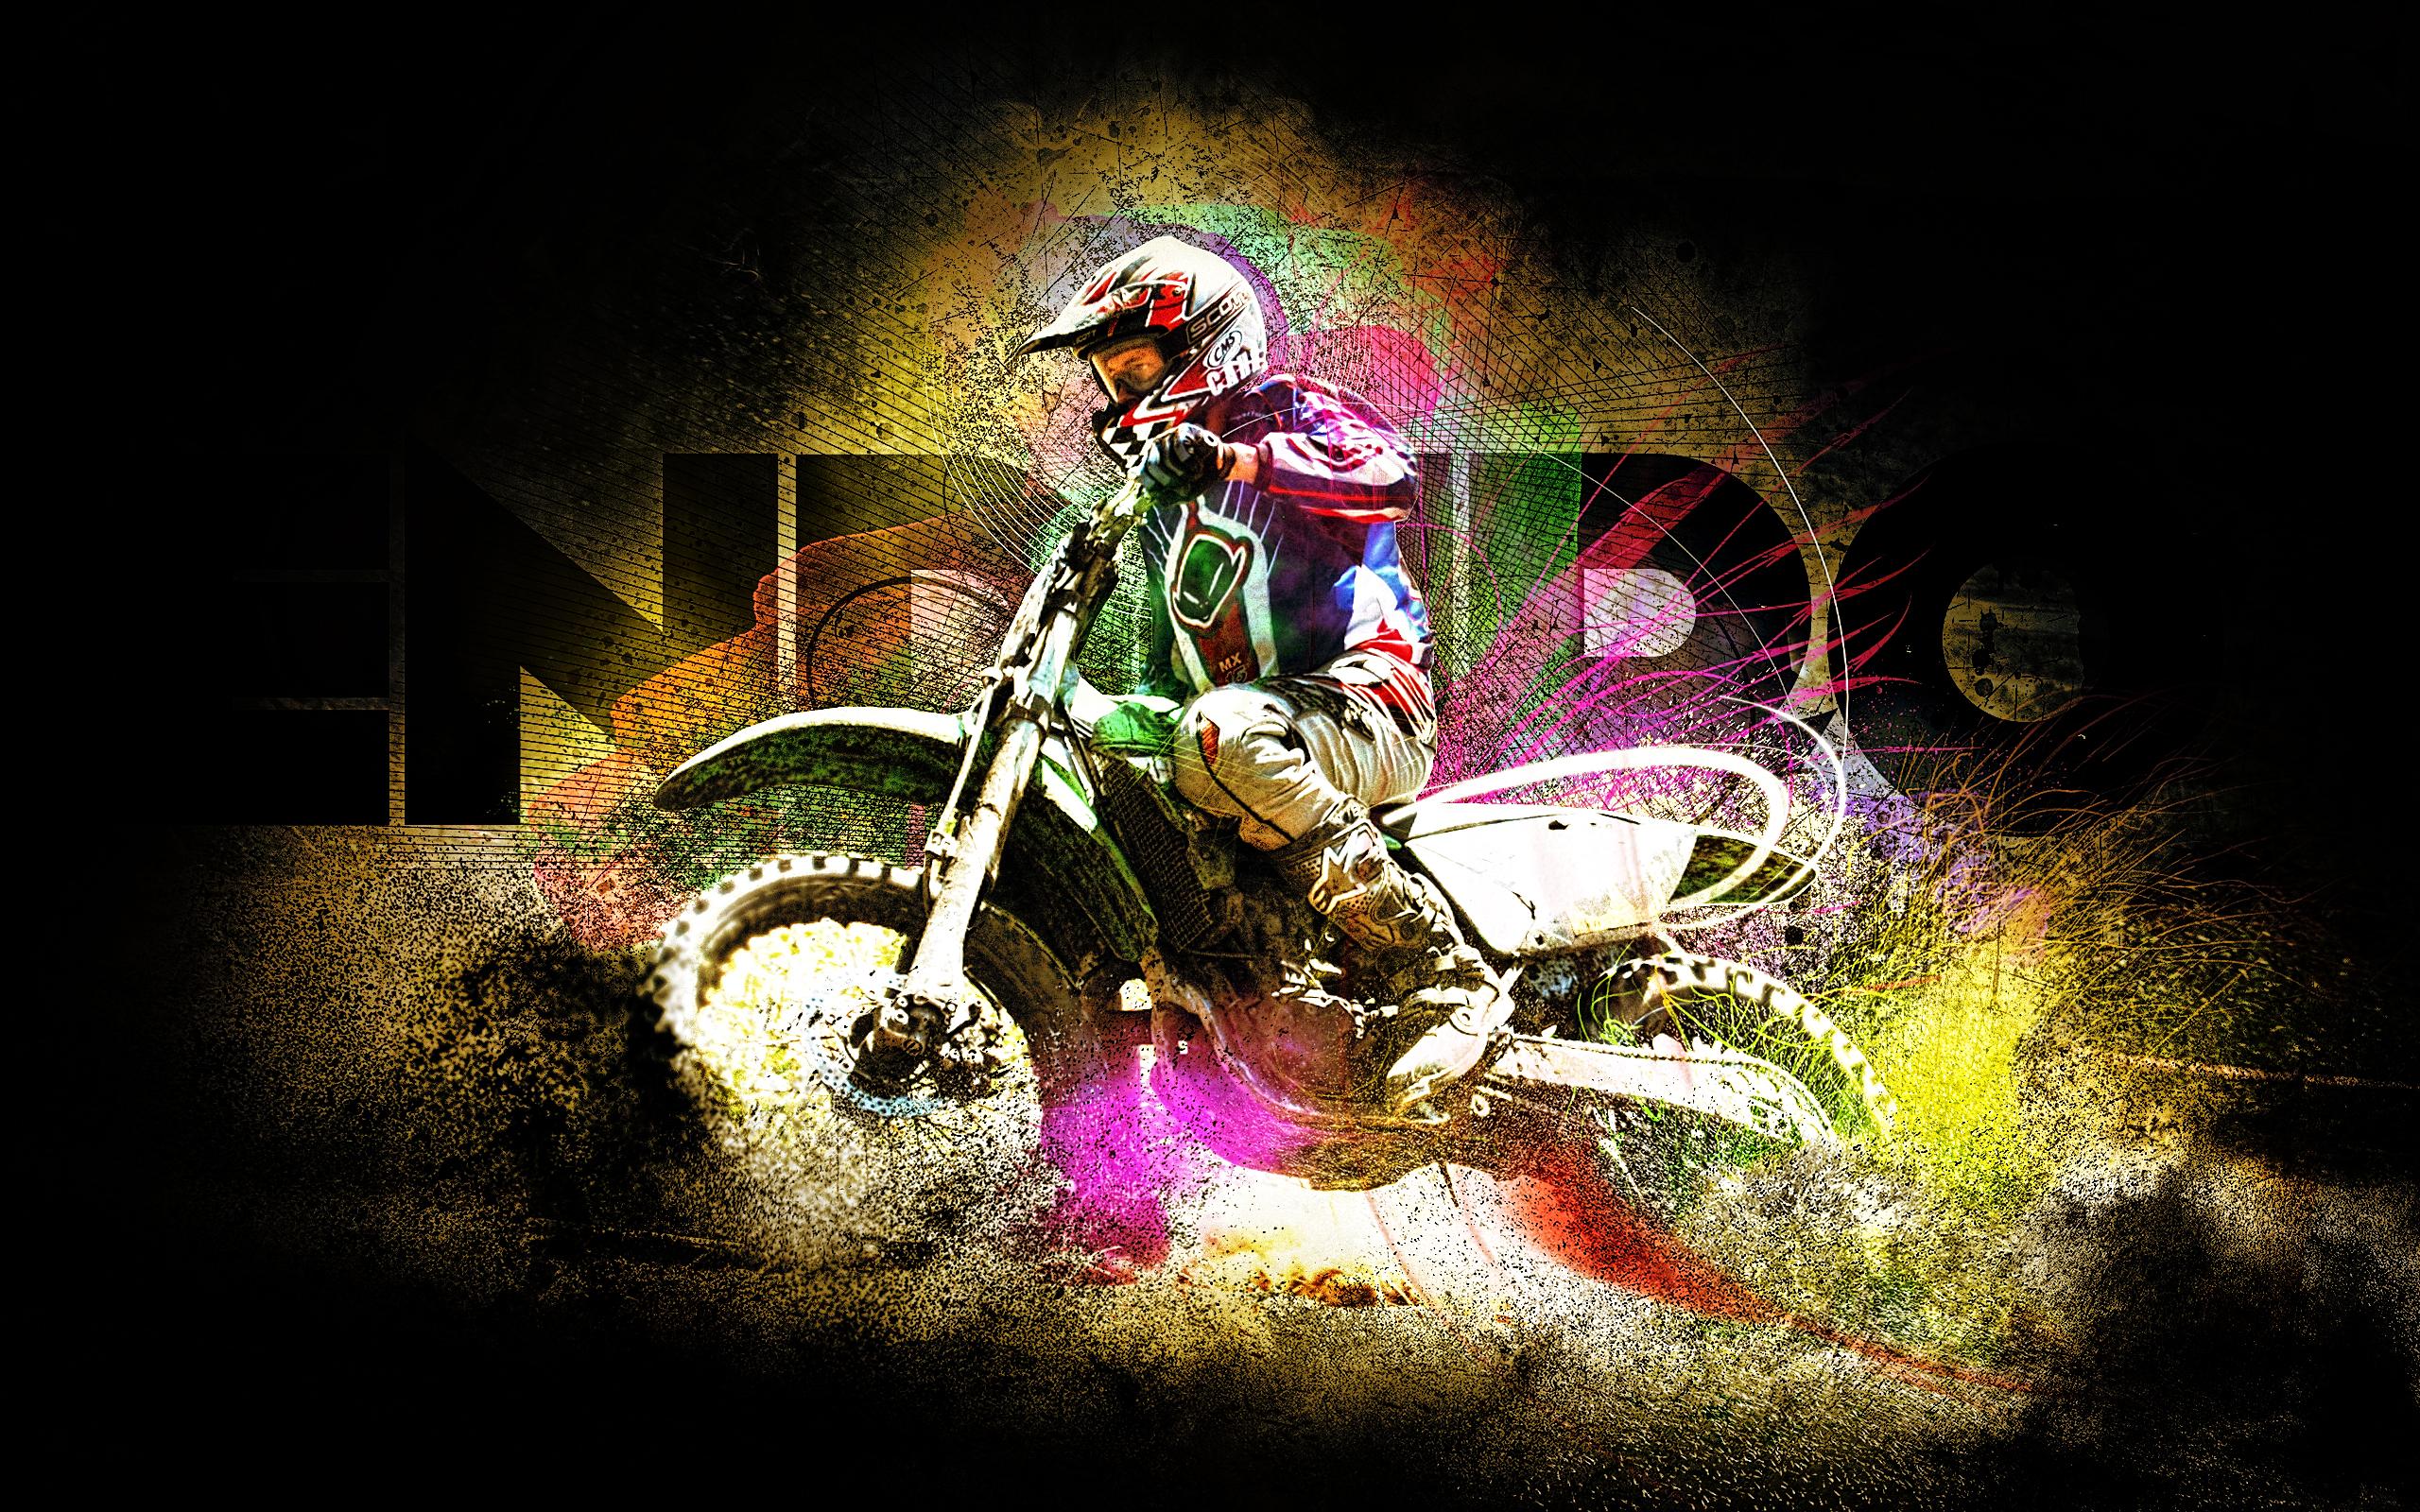 Fox Racing Wallpapers Hd Short News Poster 2560x1600